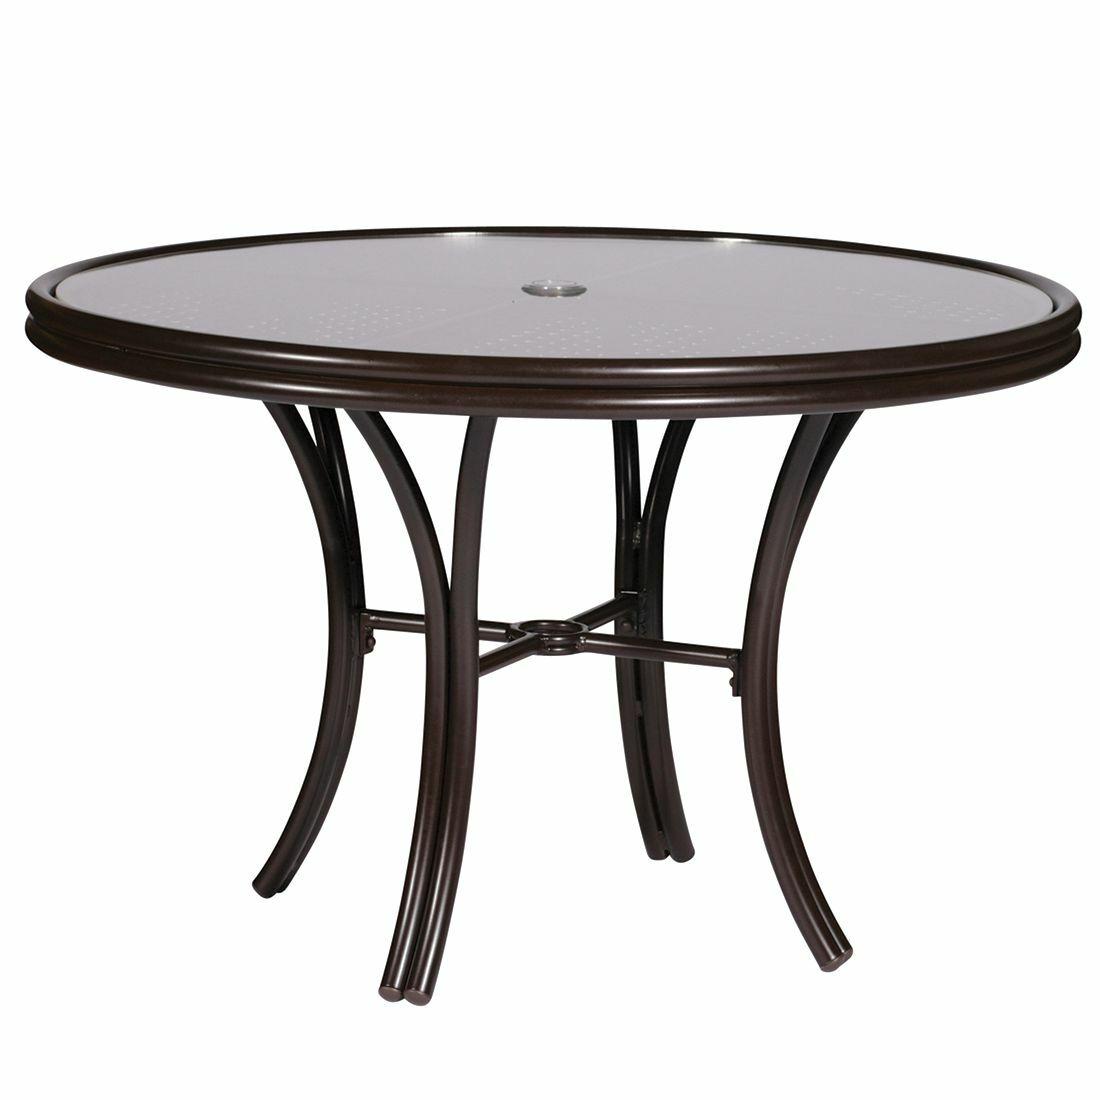 Kipling Wicker Dining Table